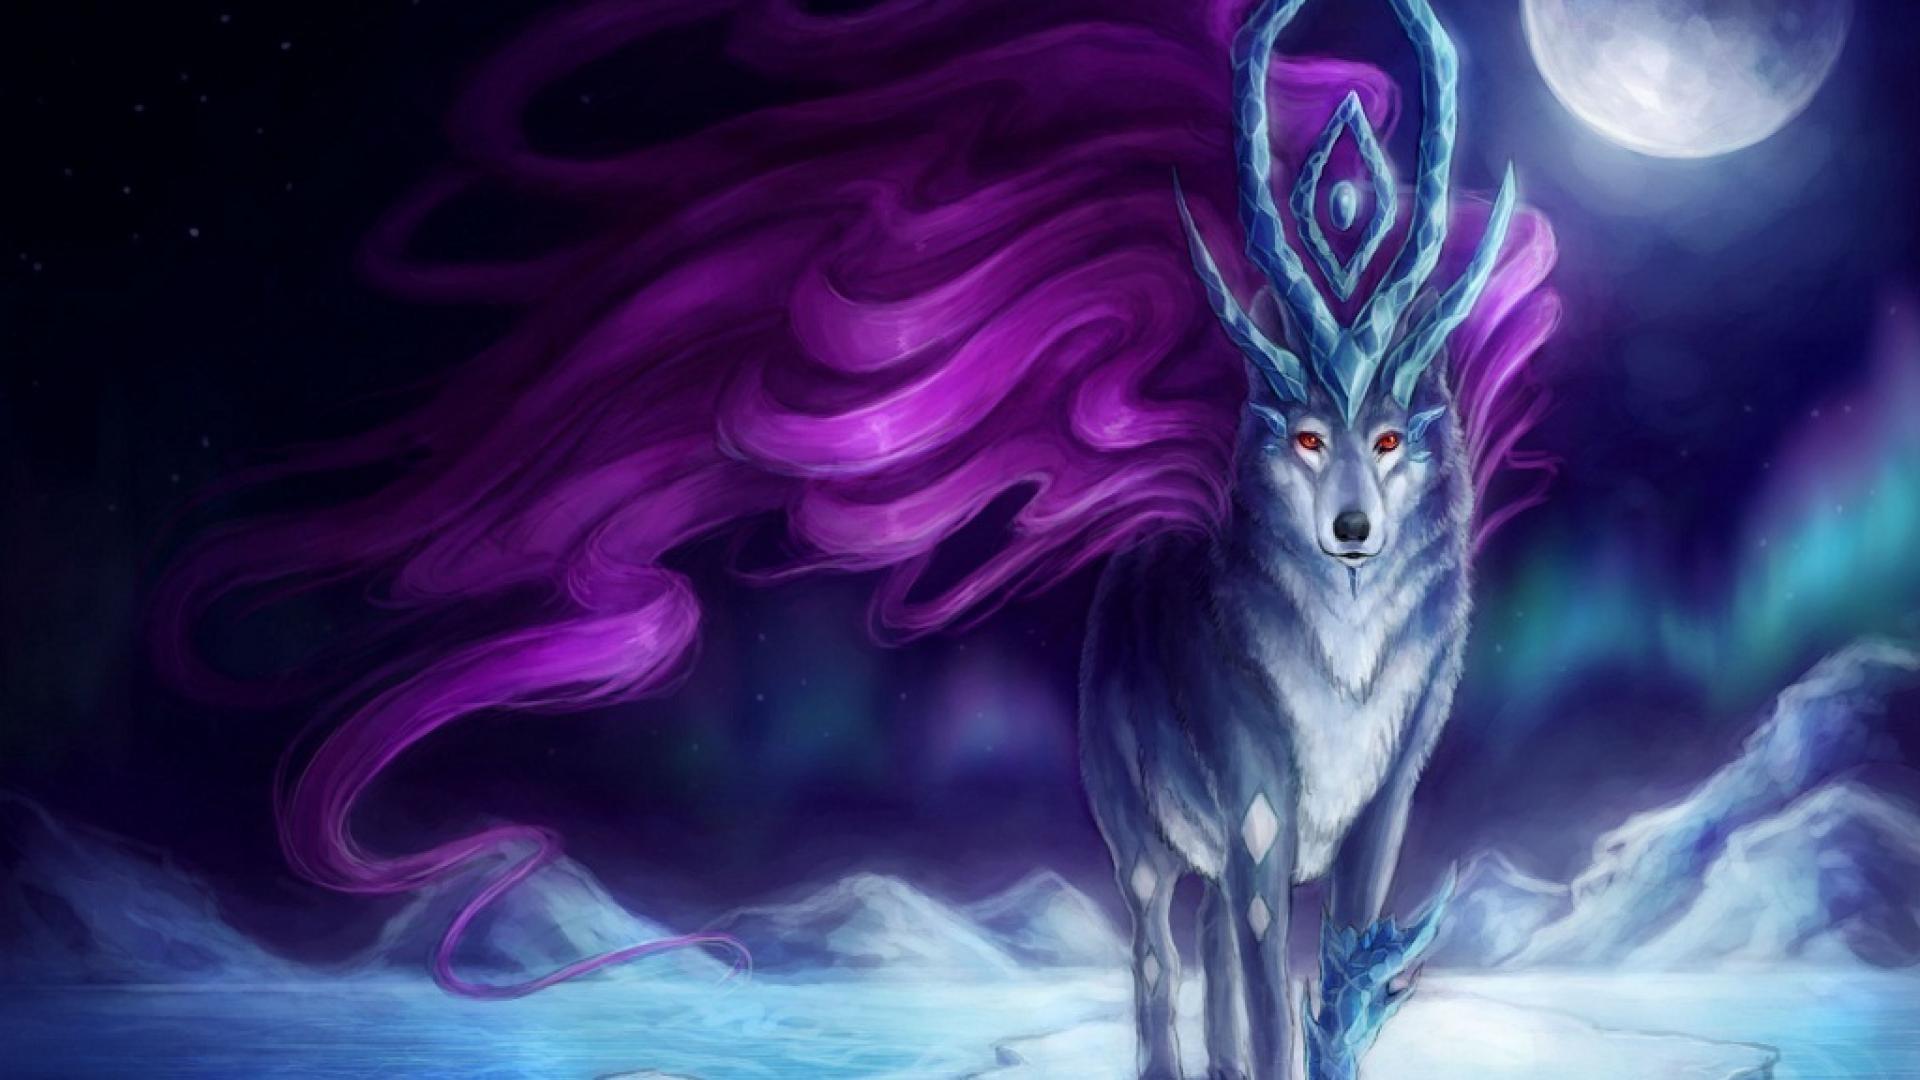 … Today Wallpaper Download picture parts of 17 Terbaik Ide Tentang Anime  Wolf Wallpaper Di Pinterest Lobo